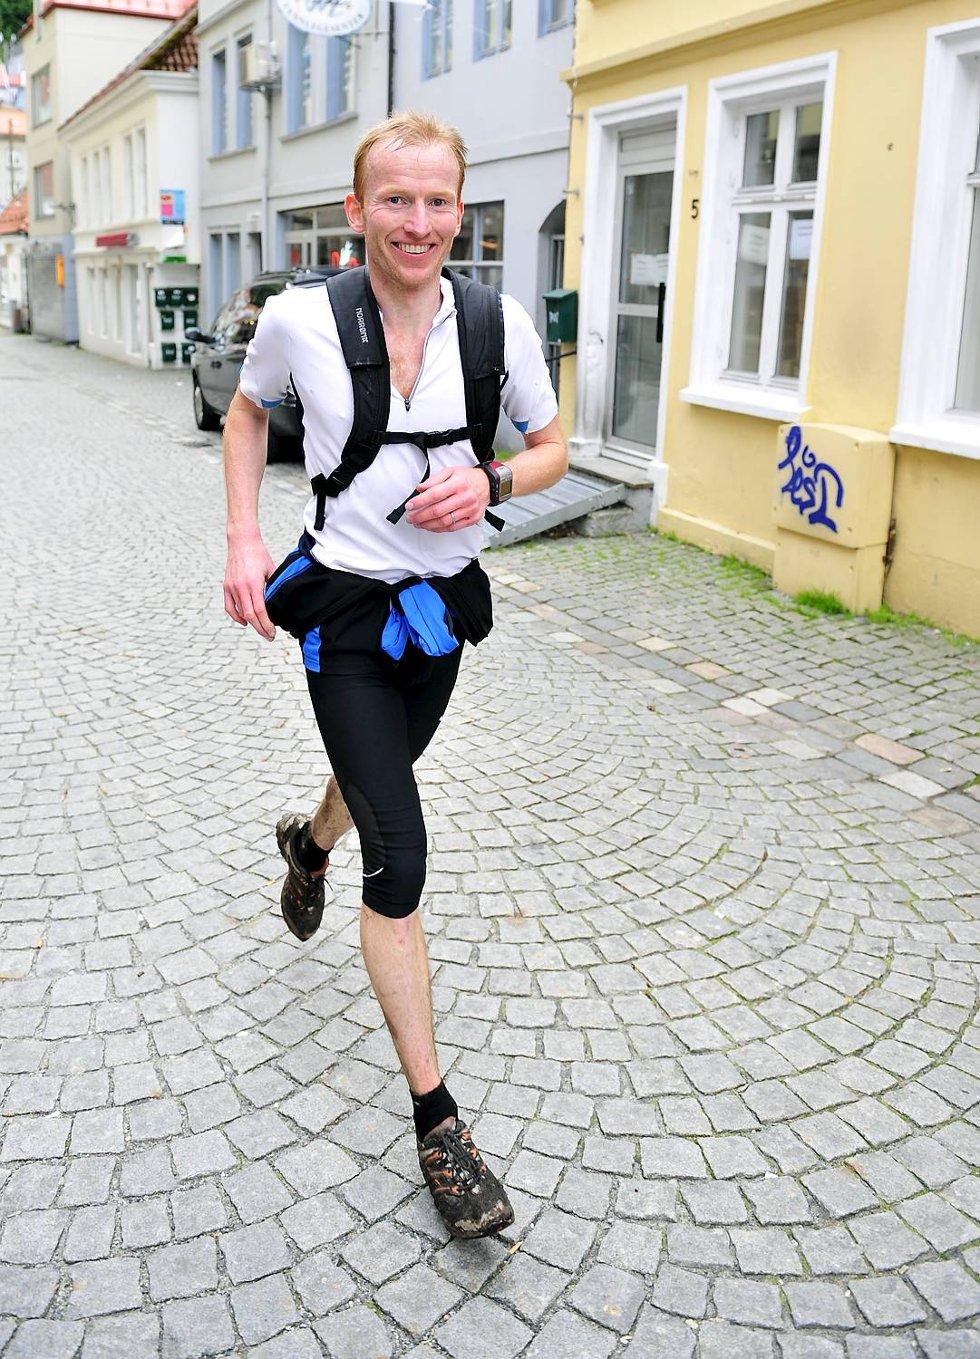 Sverre Slethaug var førstemann i mål under 7-fjellsturen. (Foto: Magne Turøy)